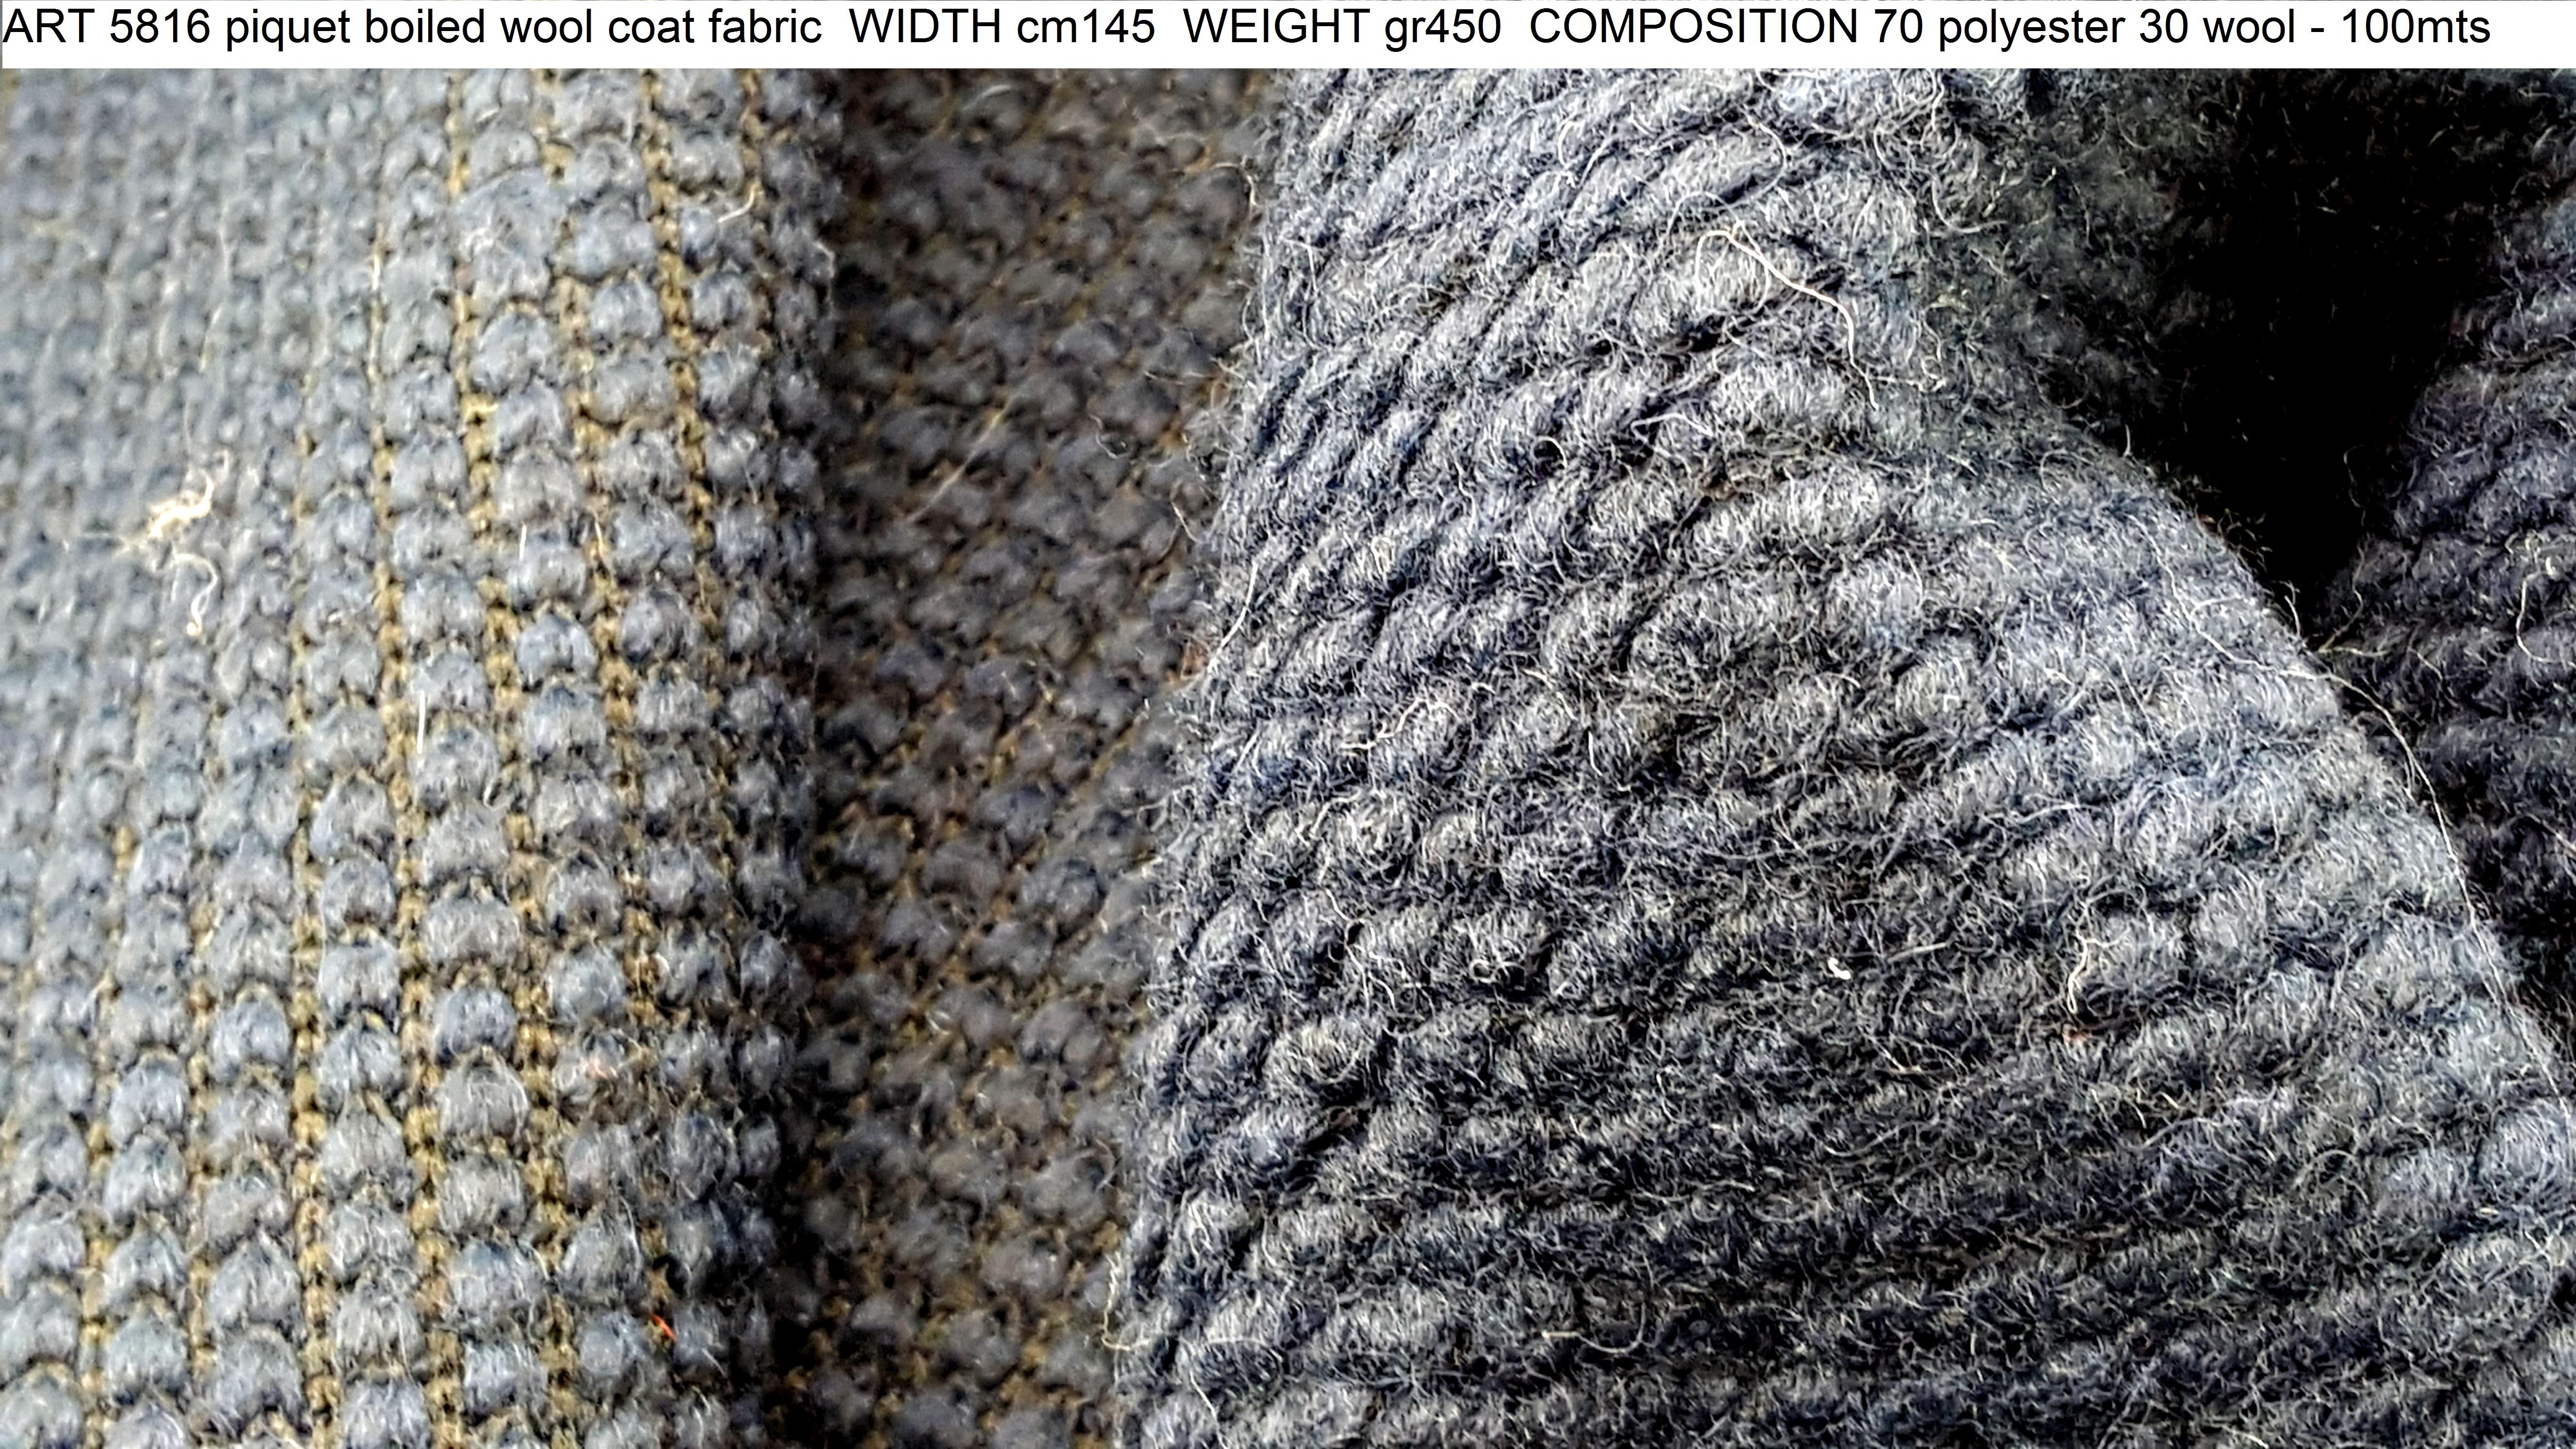 ART 5816 piquet boiled wool coat fabric WIDTH cm145 WEIGHT gr450 COMPOSITION 70 polyester 30 wool - 100mts